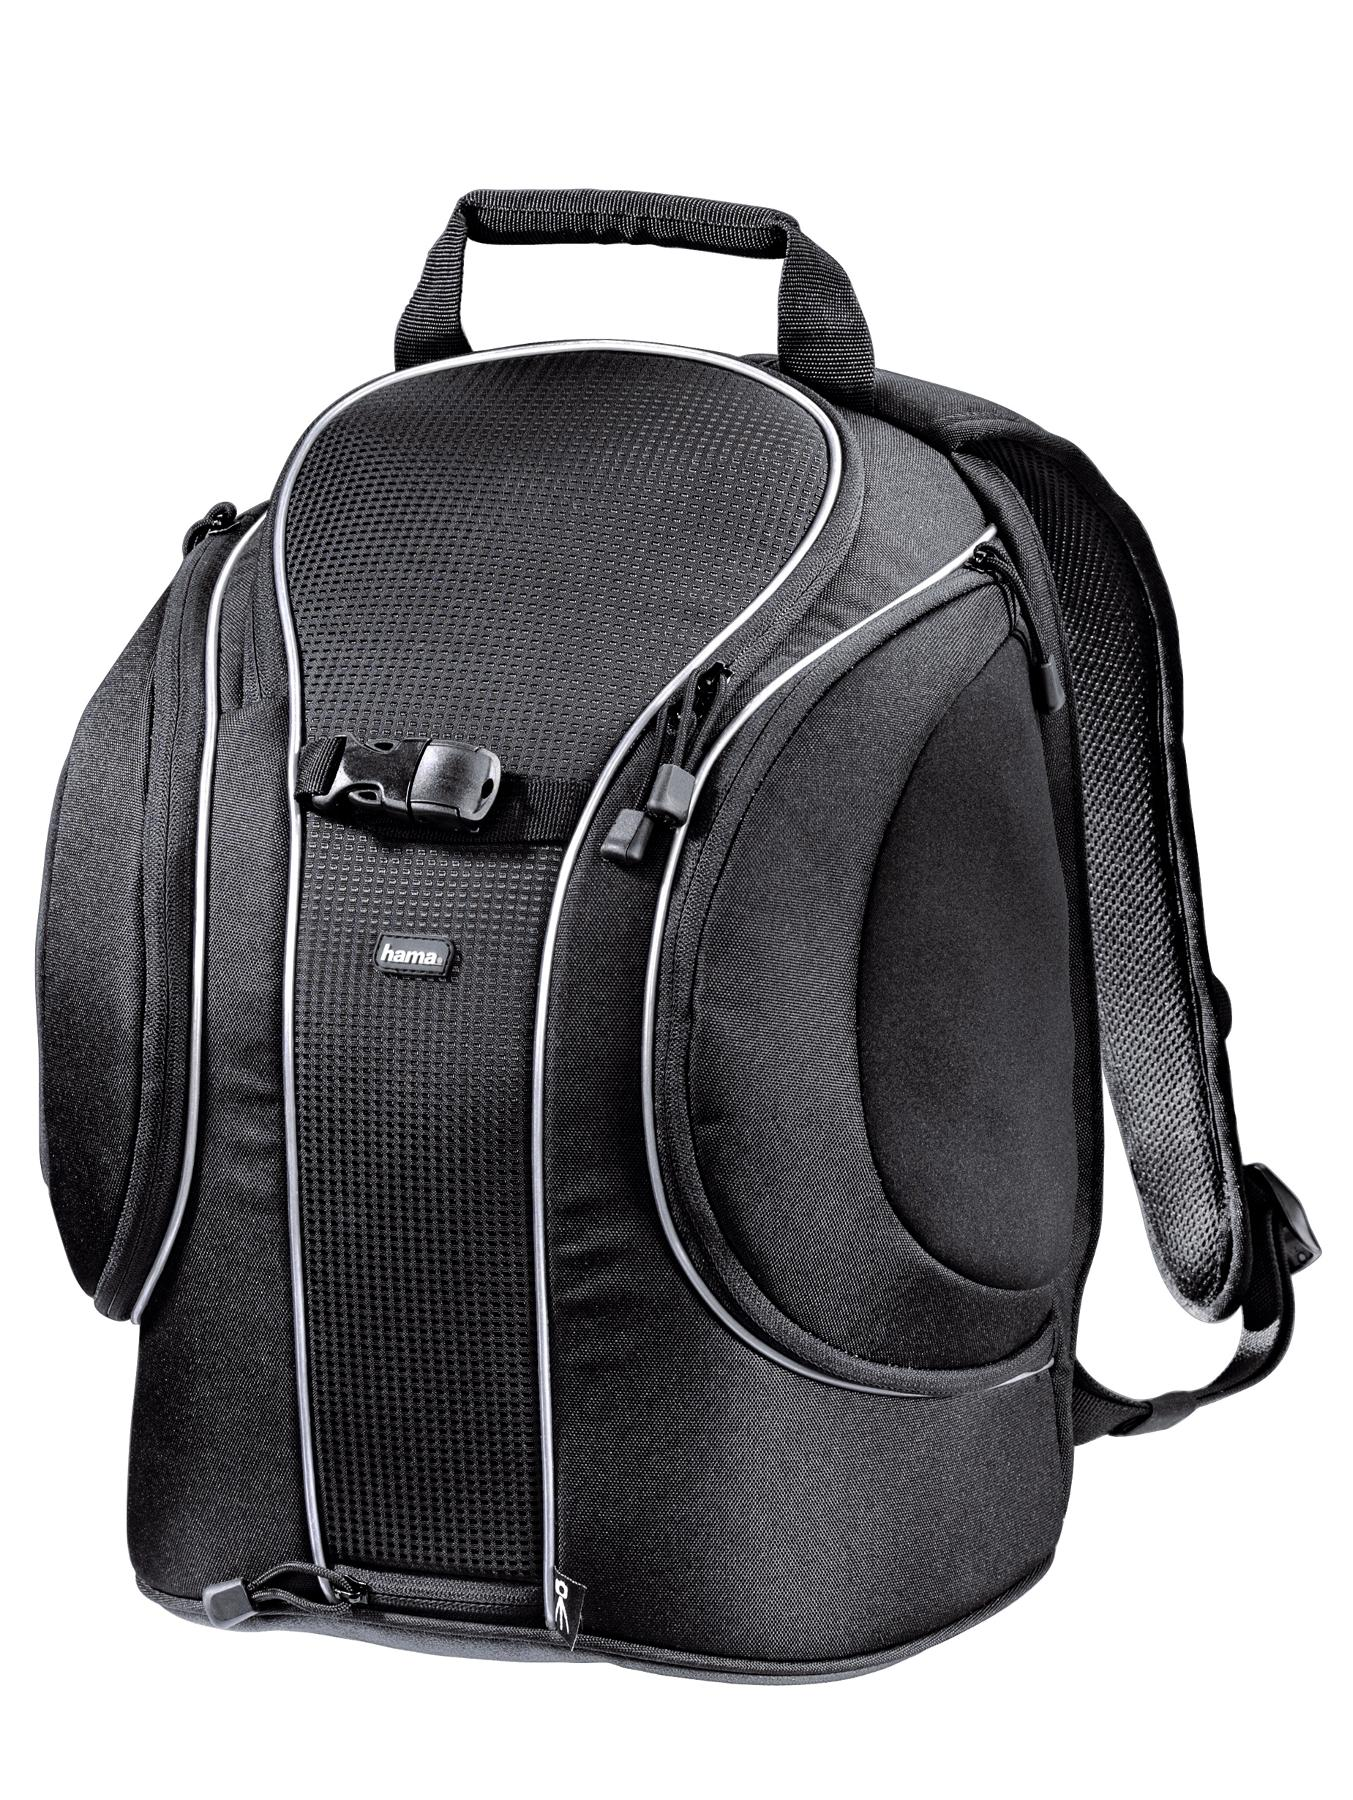 Daytour 180 Camera Backpack